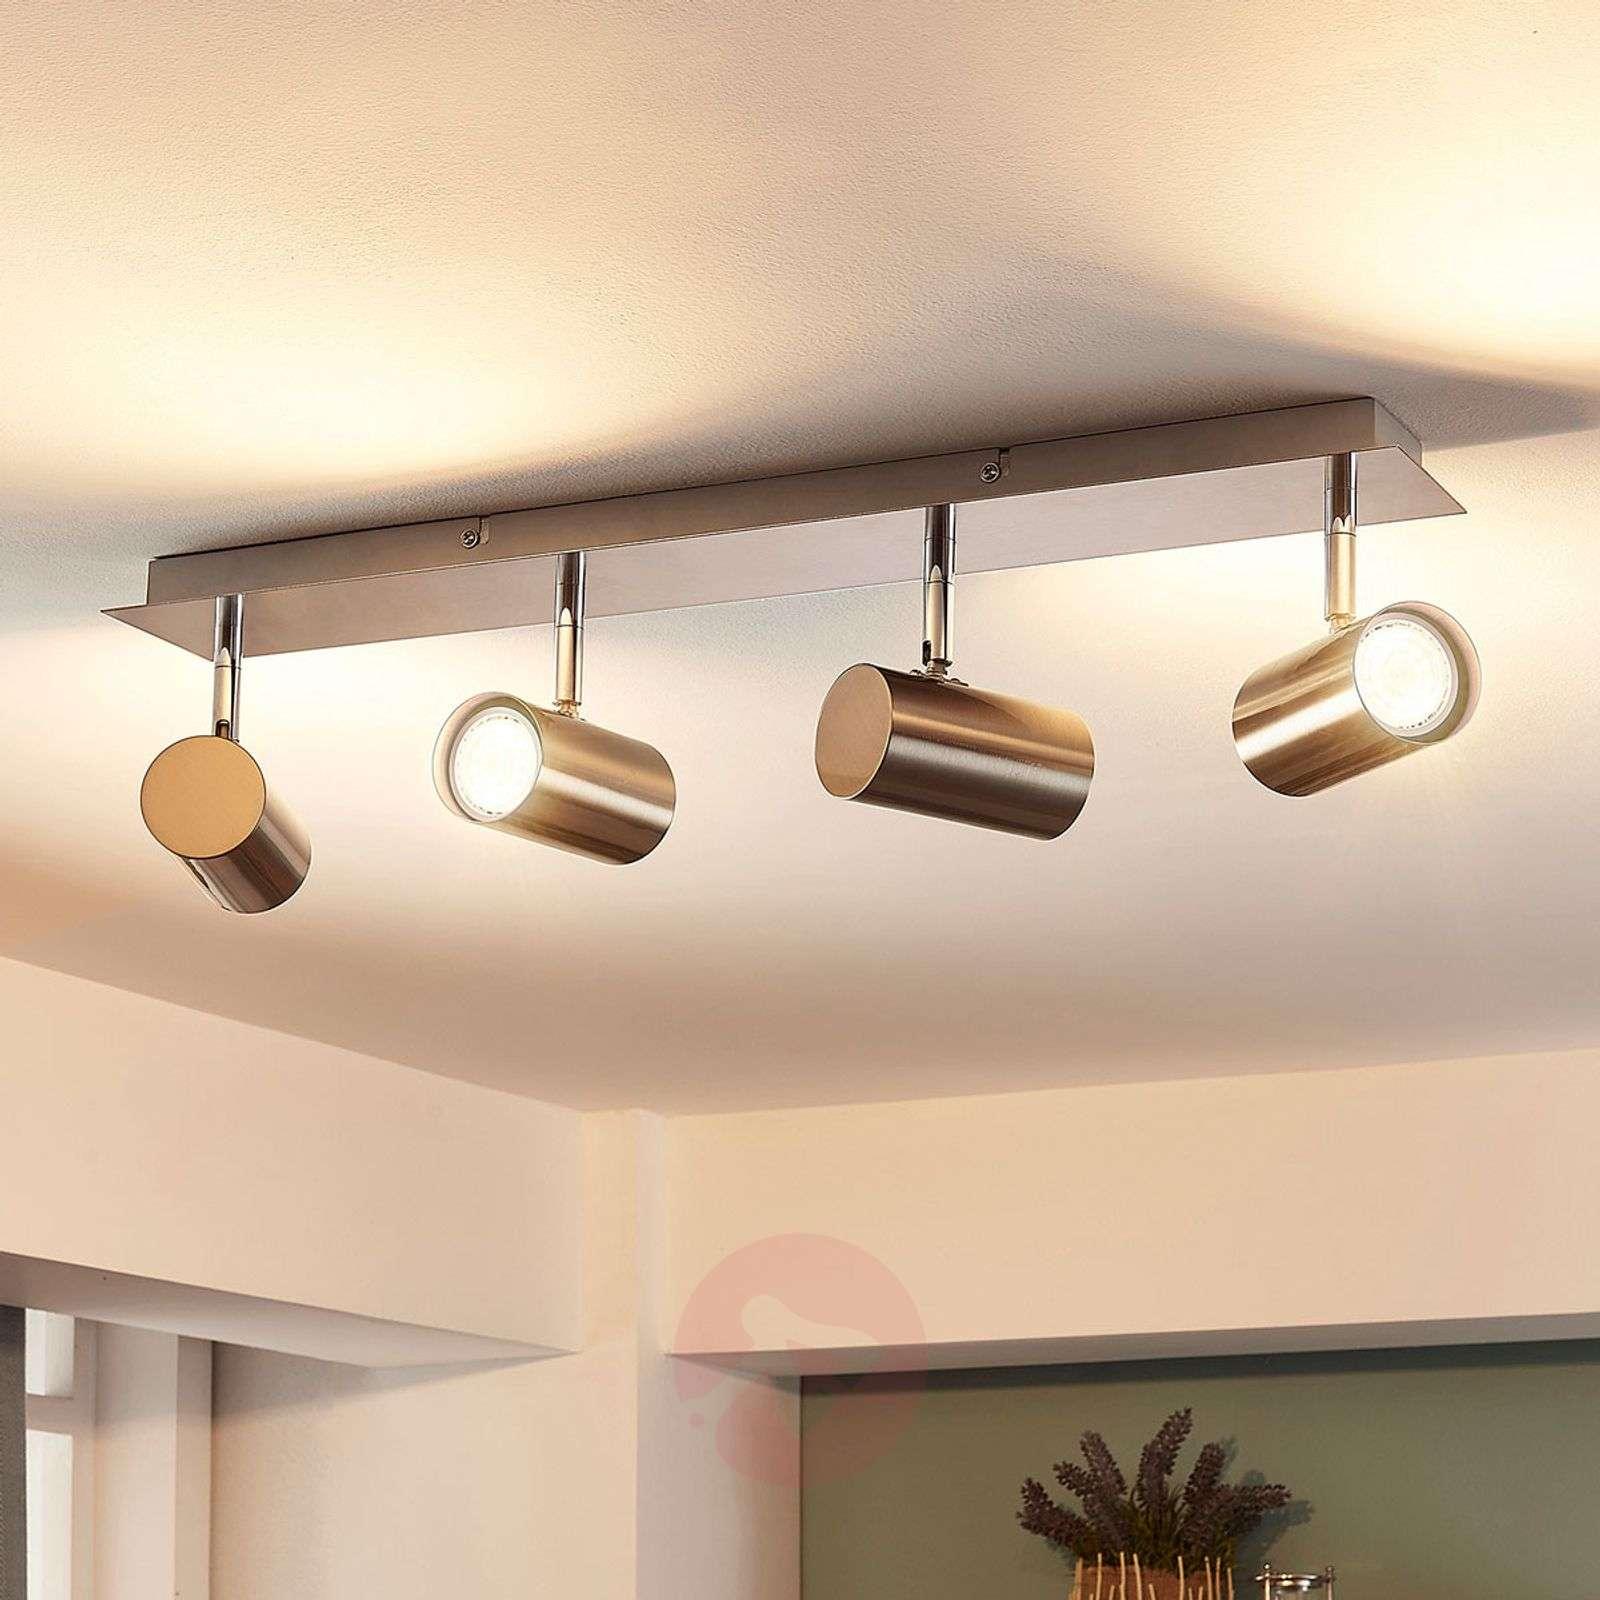 Iluk four bulb led ceiling lamp in nickel